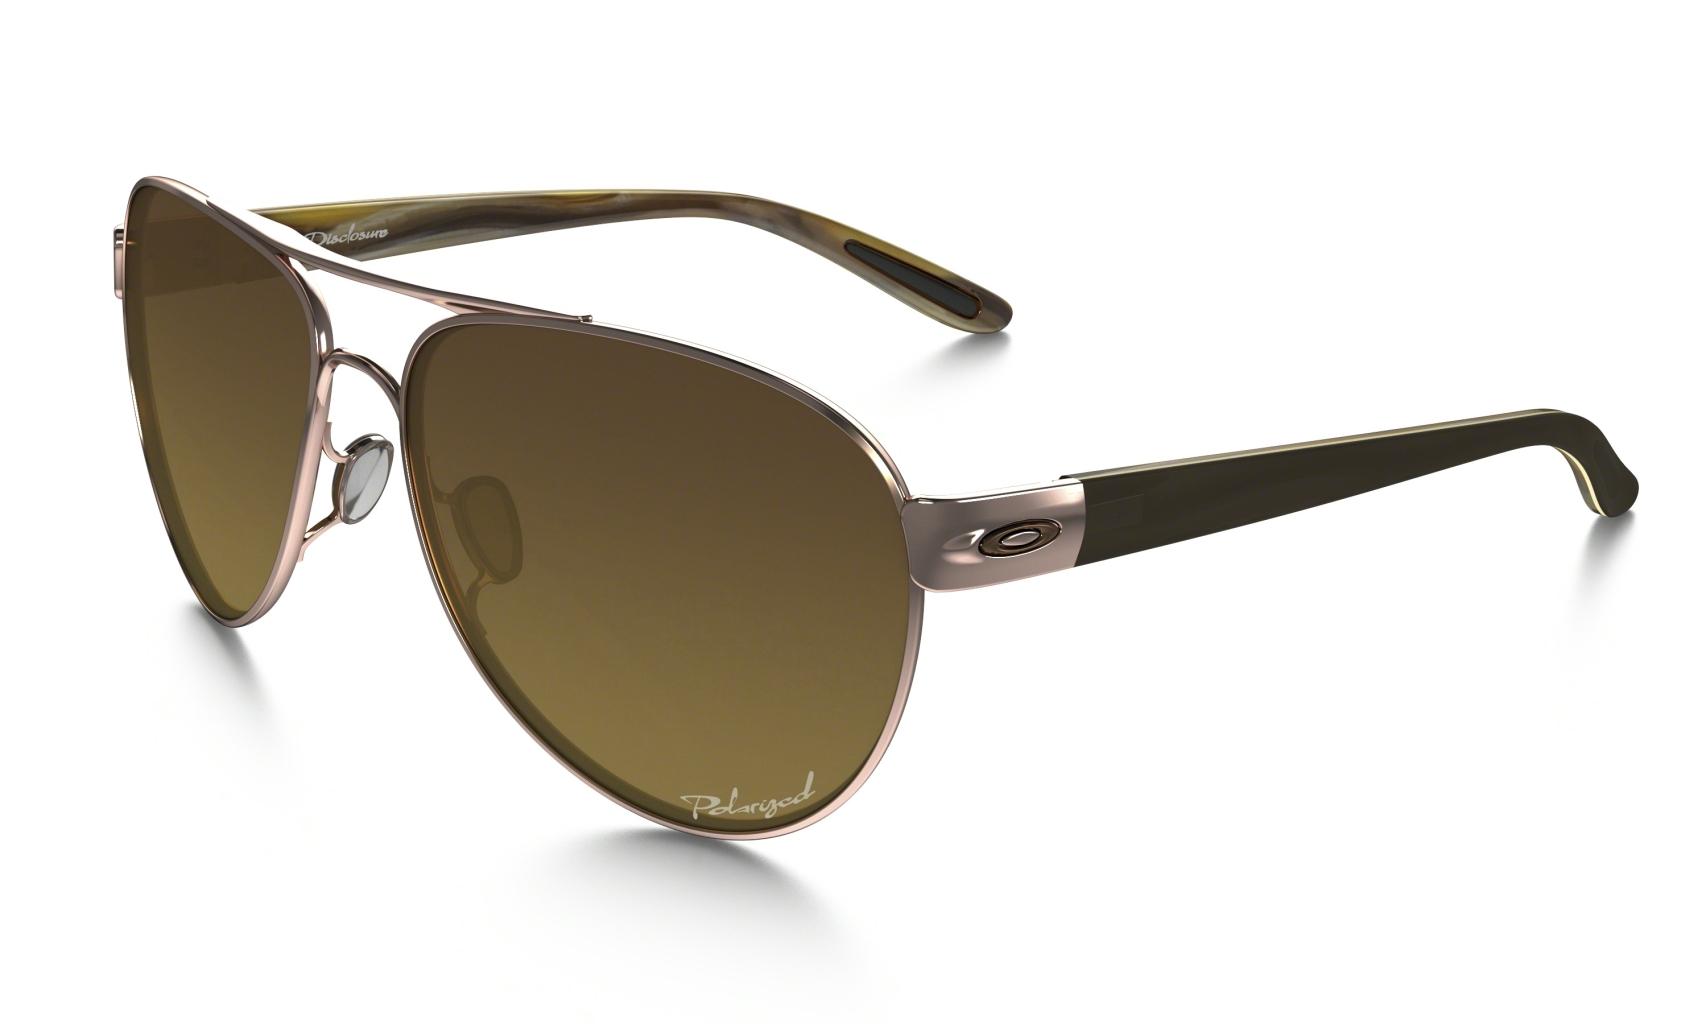 e052215545 Oakley Disclosure Rose Gold w Brown Grad Polar - en